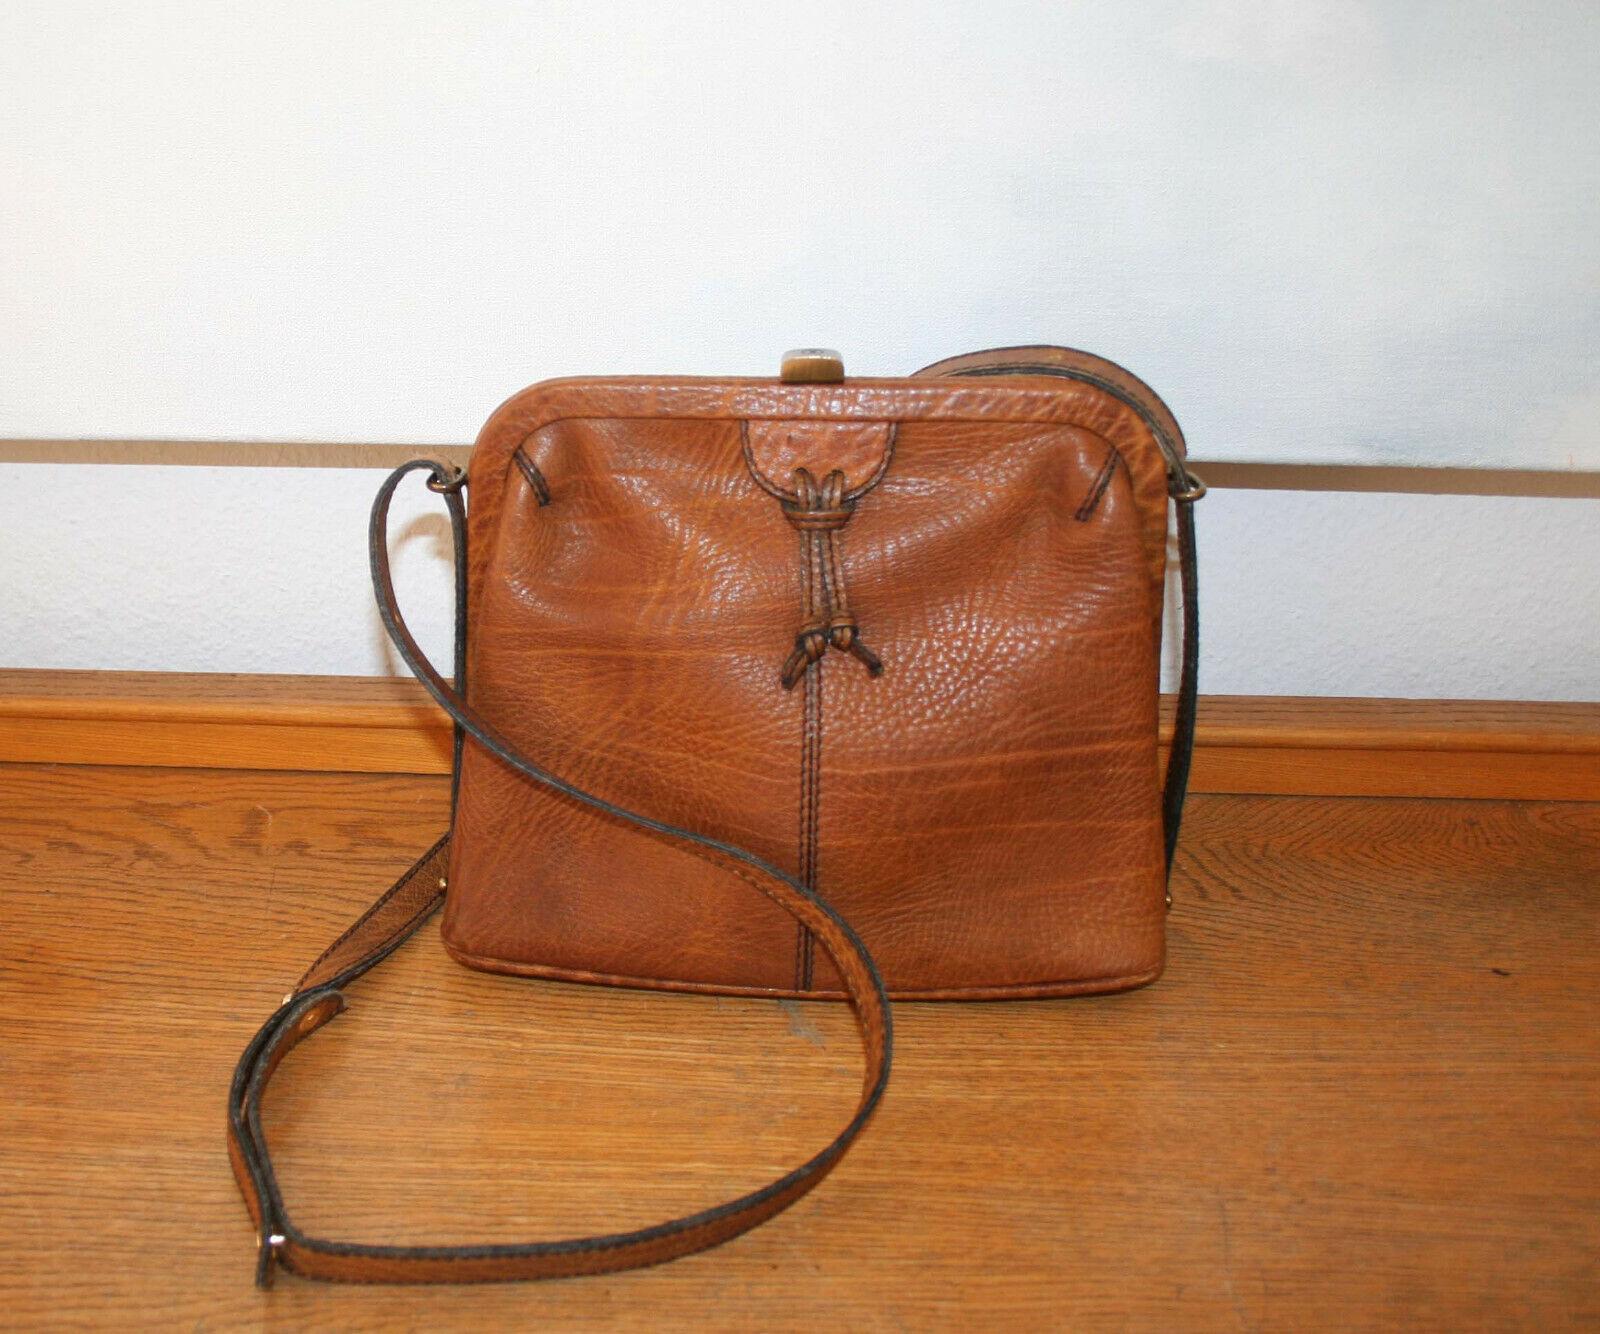 dc259d35fbea6f Goldpfeil Caracciola Tasche, lässige Vintage Vintage Vintage Handtasche,  Leder, 100 % Original   Förderung 1016fb